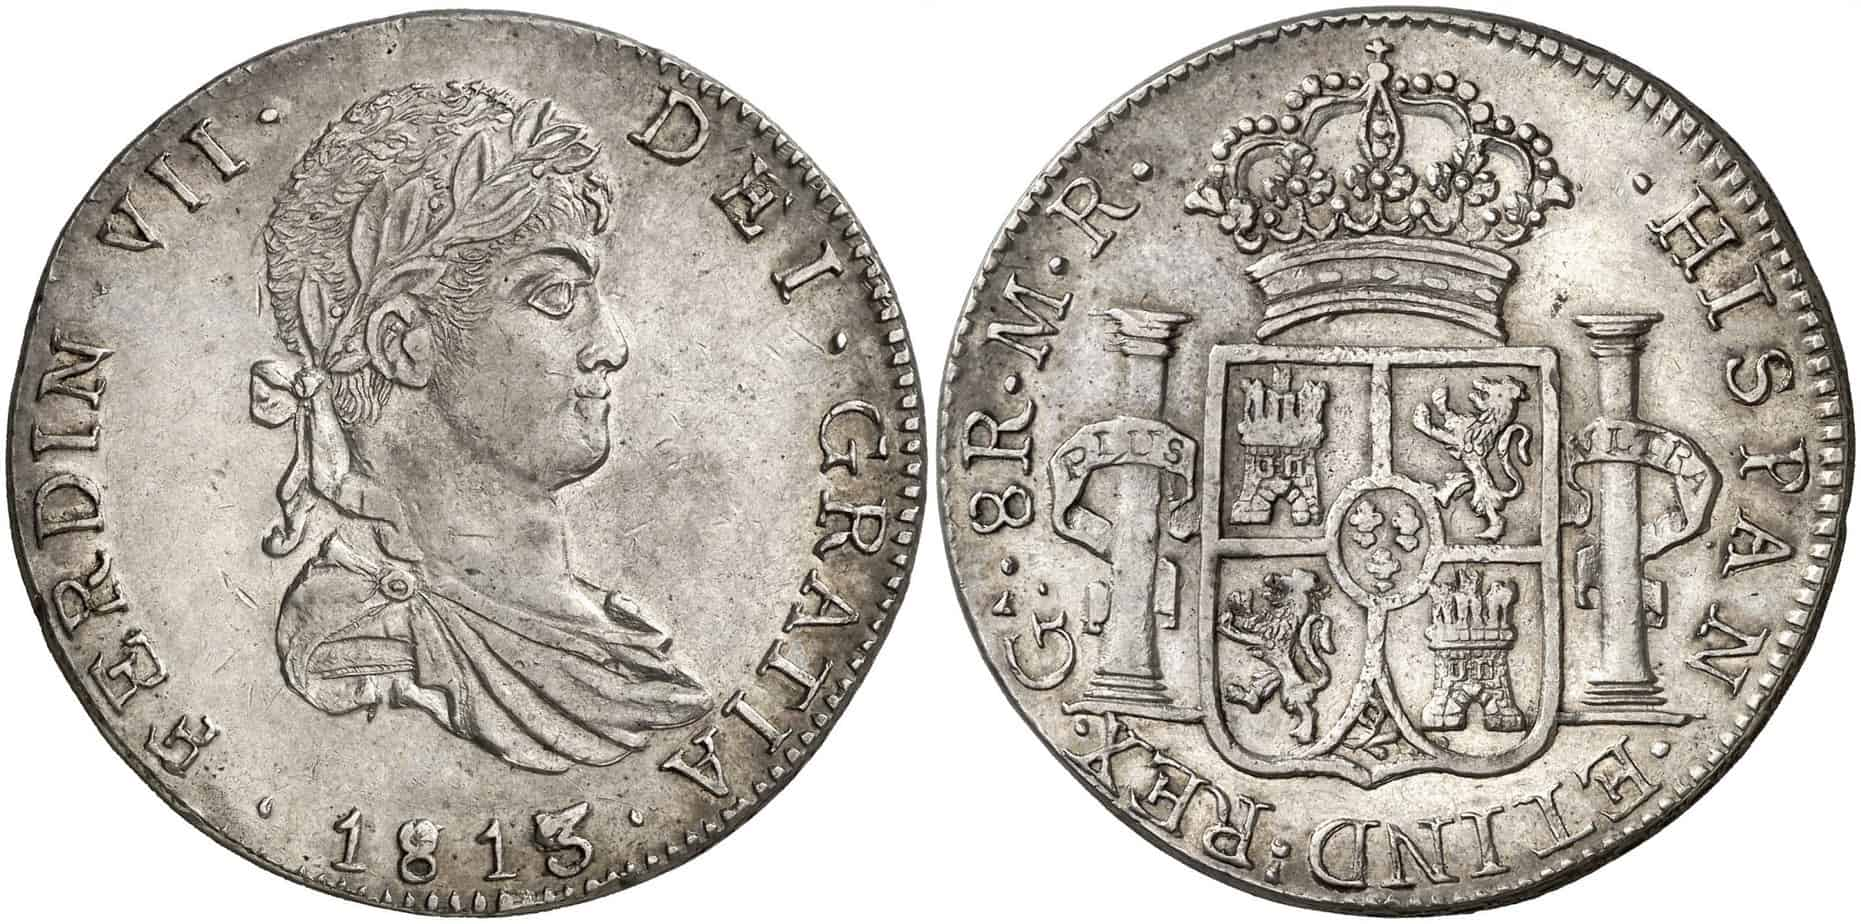 8 reales Guadelajara 1813